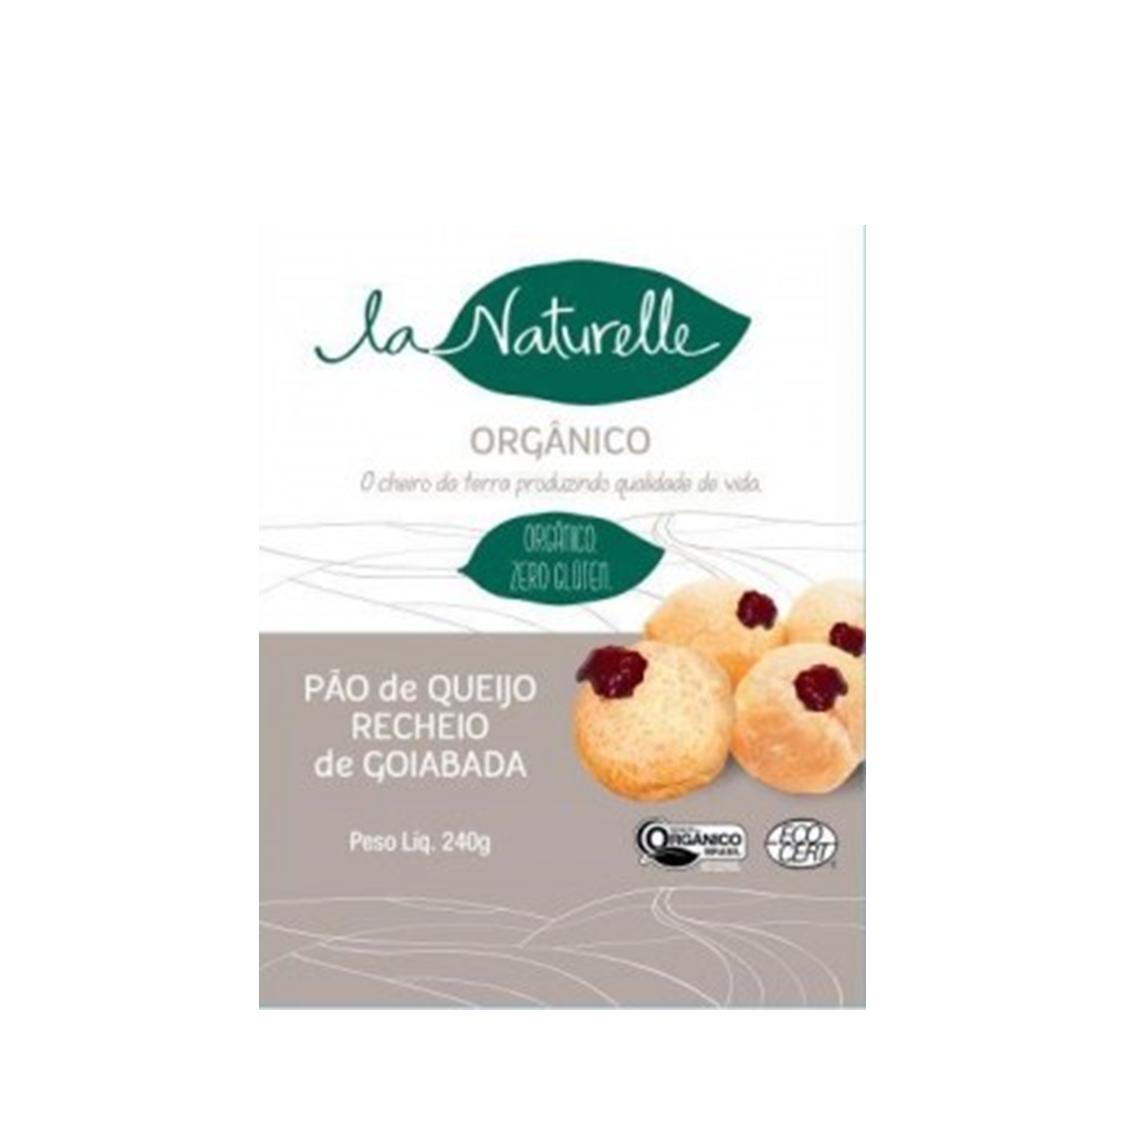 Pão de Queijo c/ Goiabada (240g) – La Naturelle